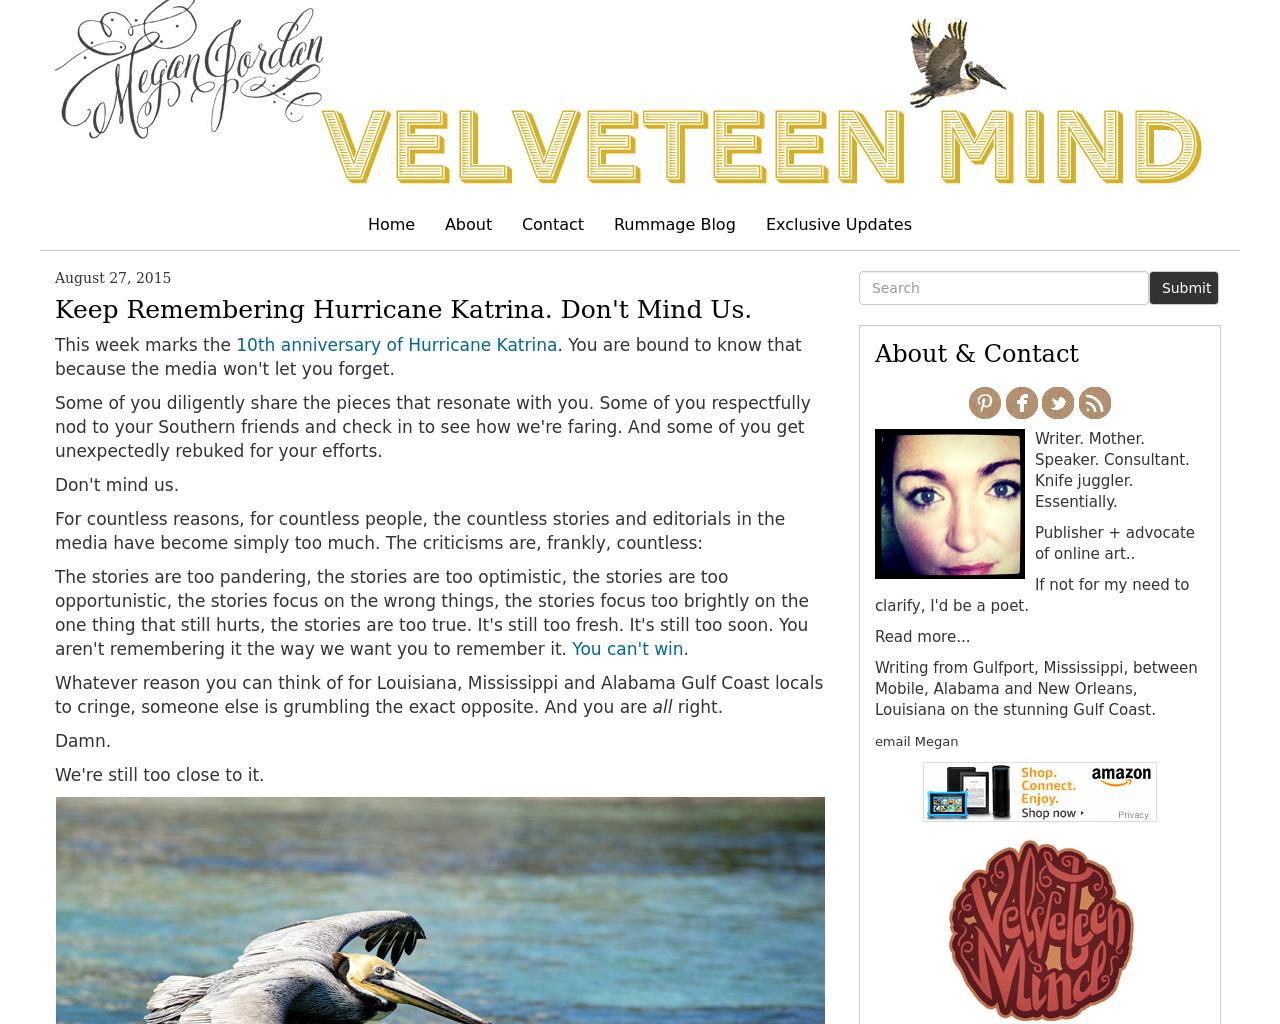 Velveteen-Mind-Advertising-Reviews-Pricing